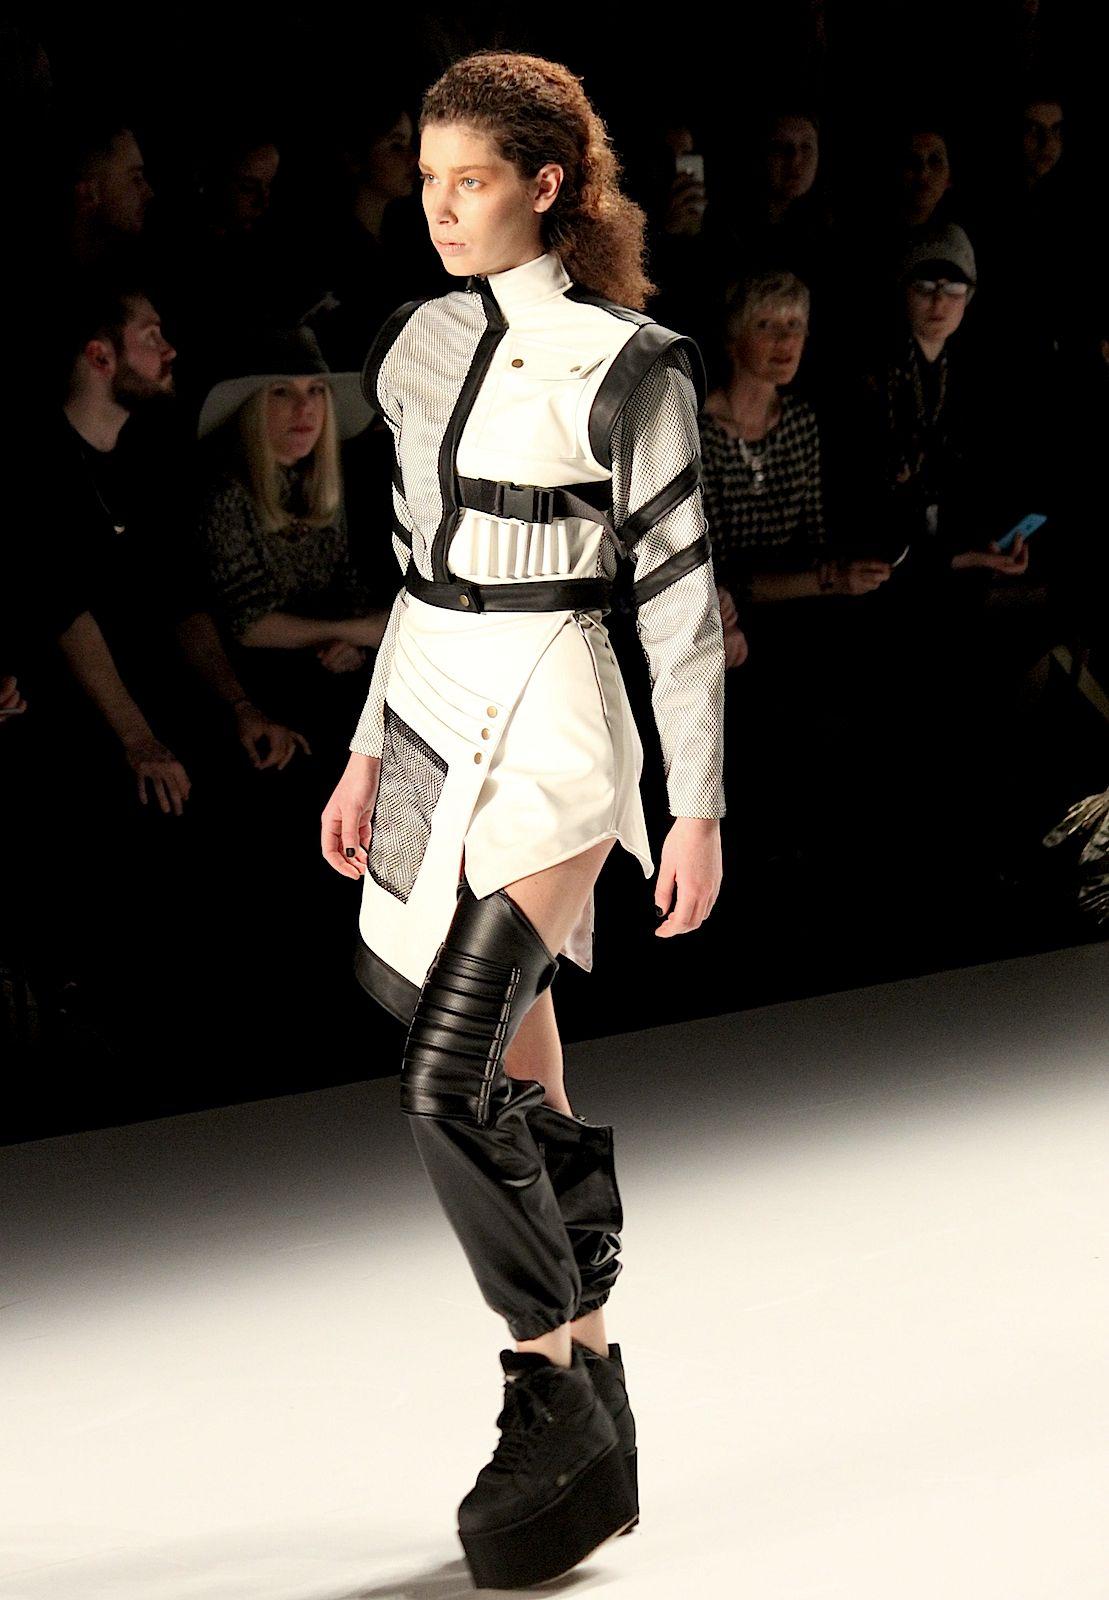 Berlin Fashion WeekPearly Wong Autumn:Winter 2015